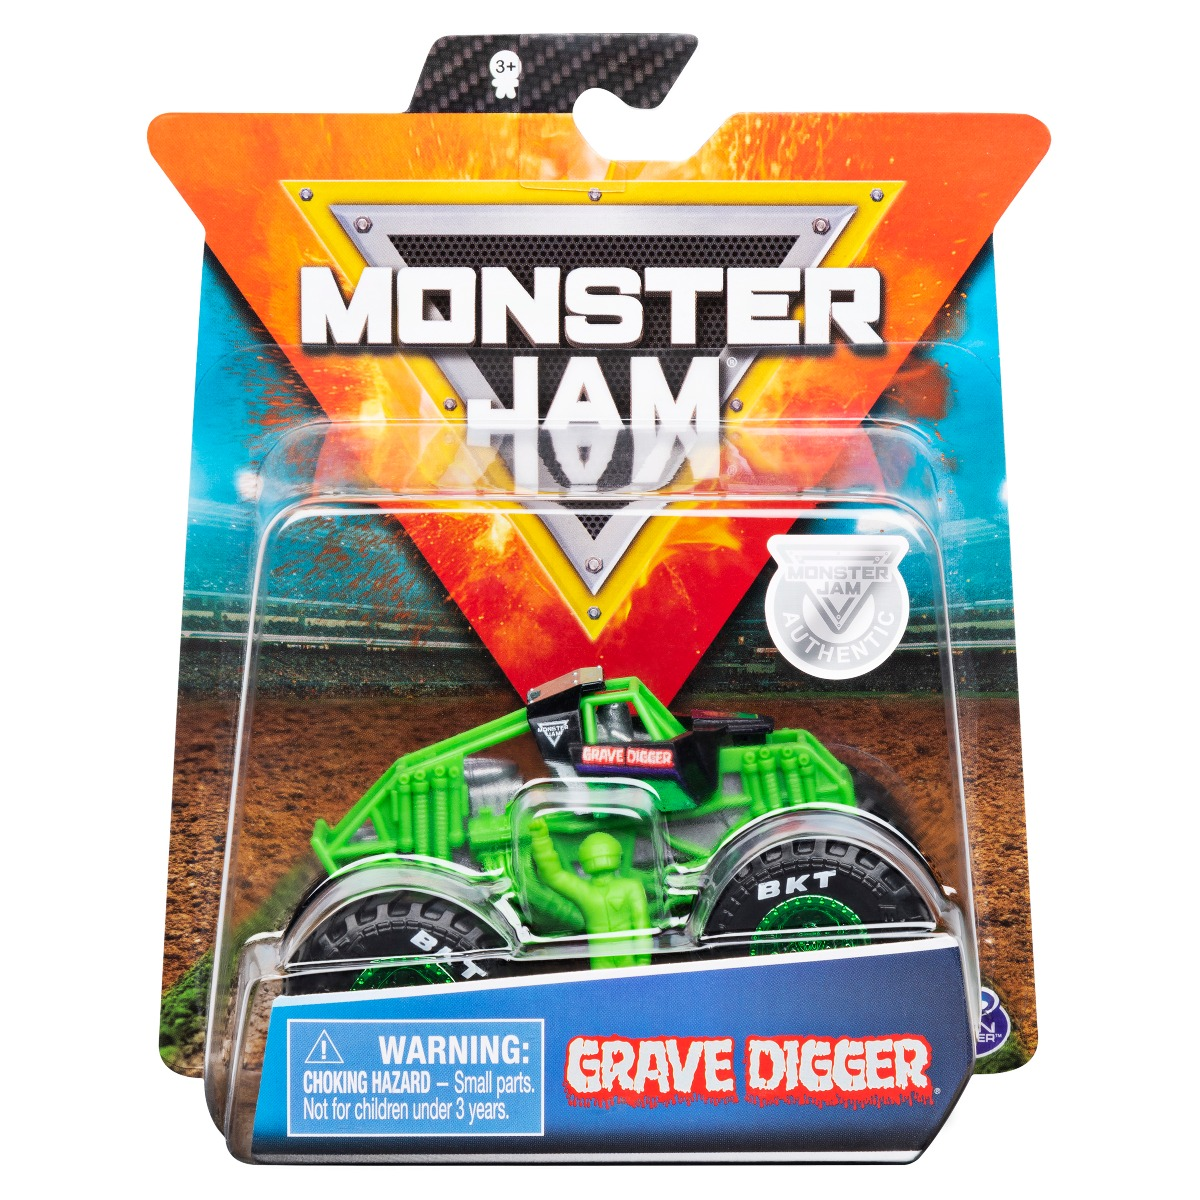 Masinuta Monster Jam, Scara 1:64, Grave Digger cu figurina, Verde